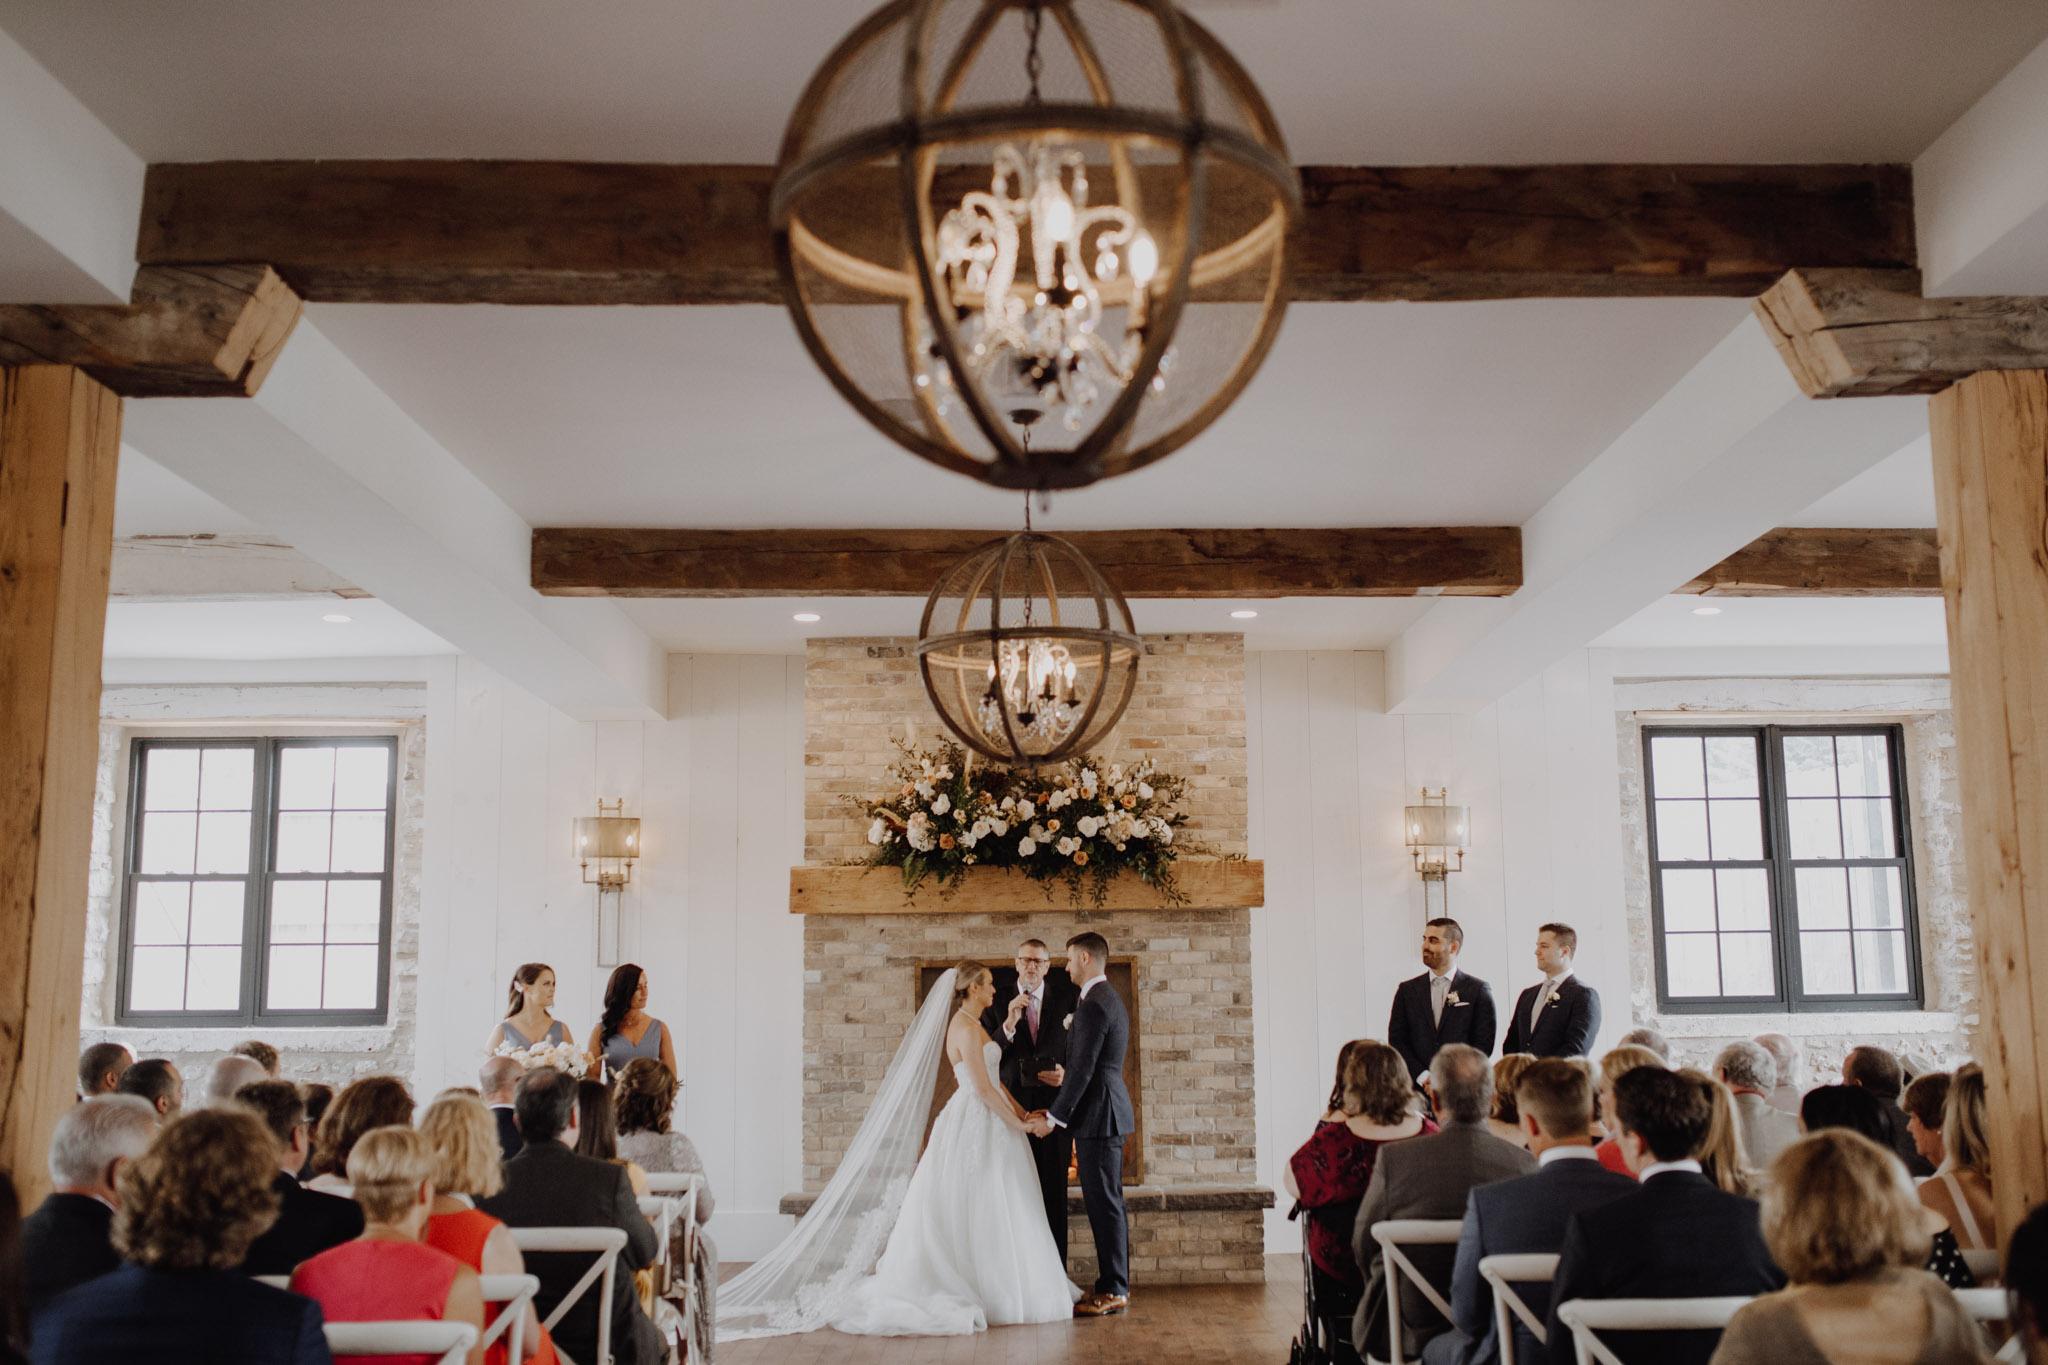 Elora Mill Wedding - ceremony